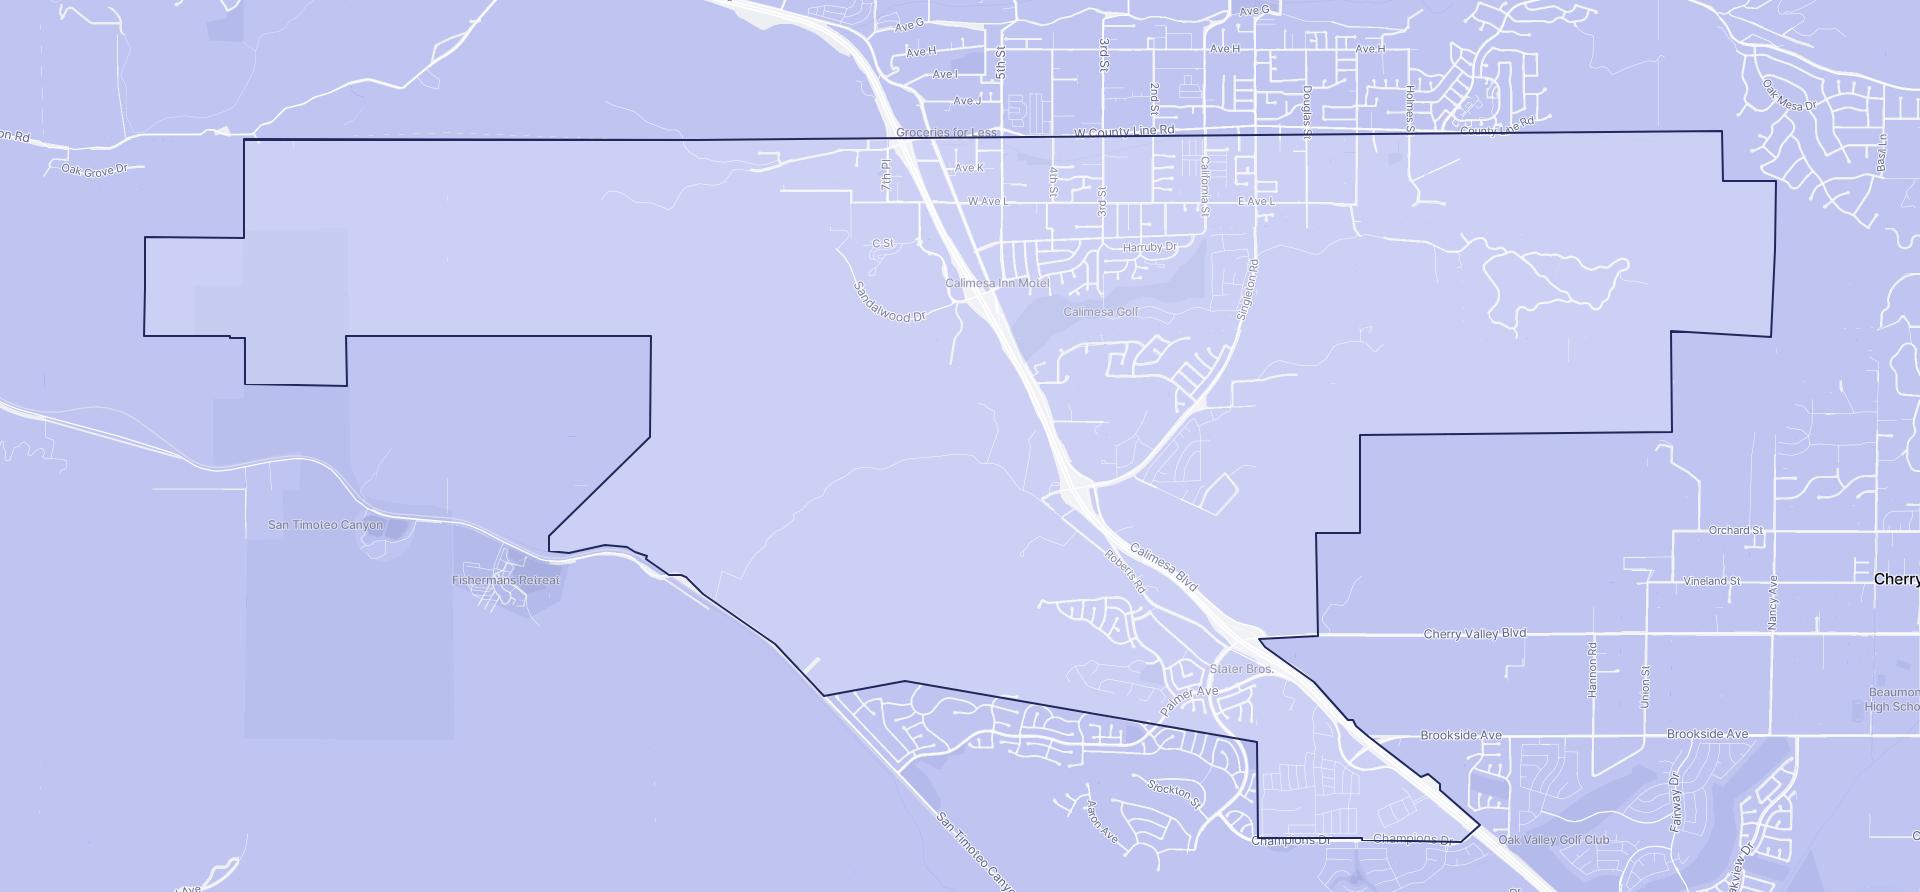 Image of Calimesa boundaries on a map.